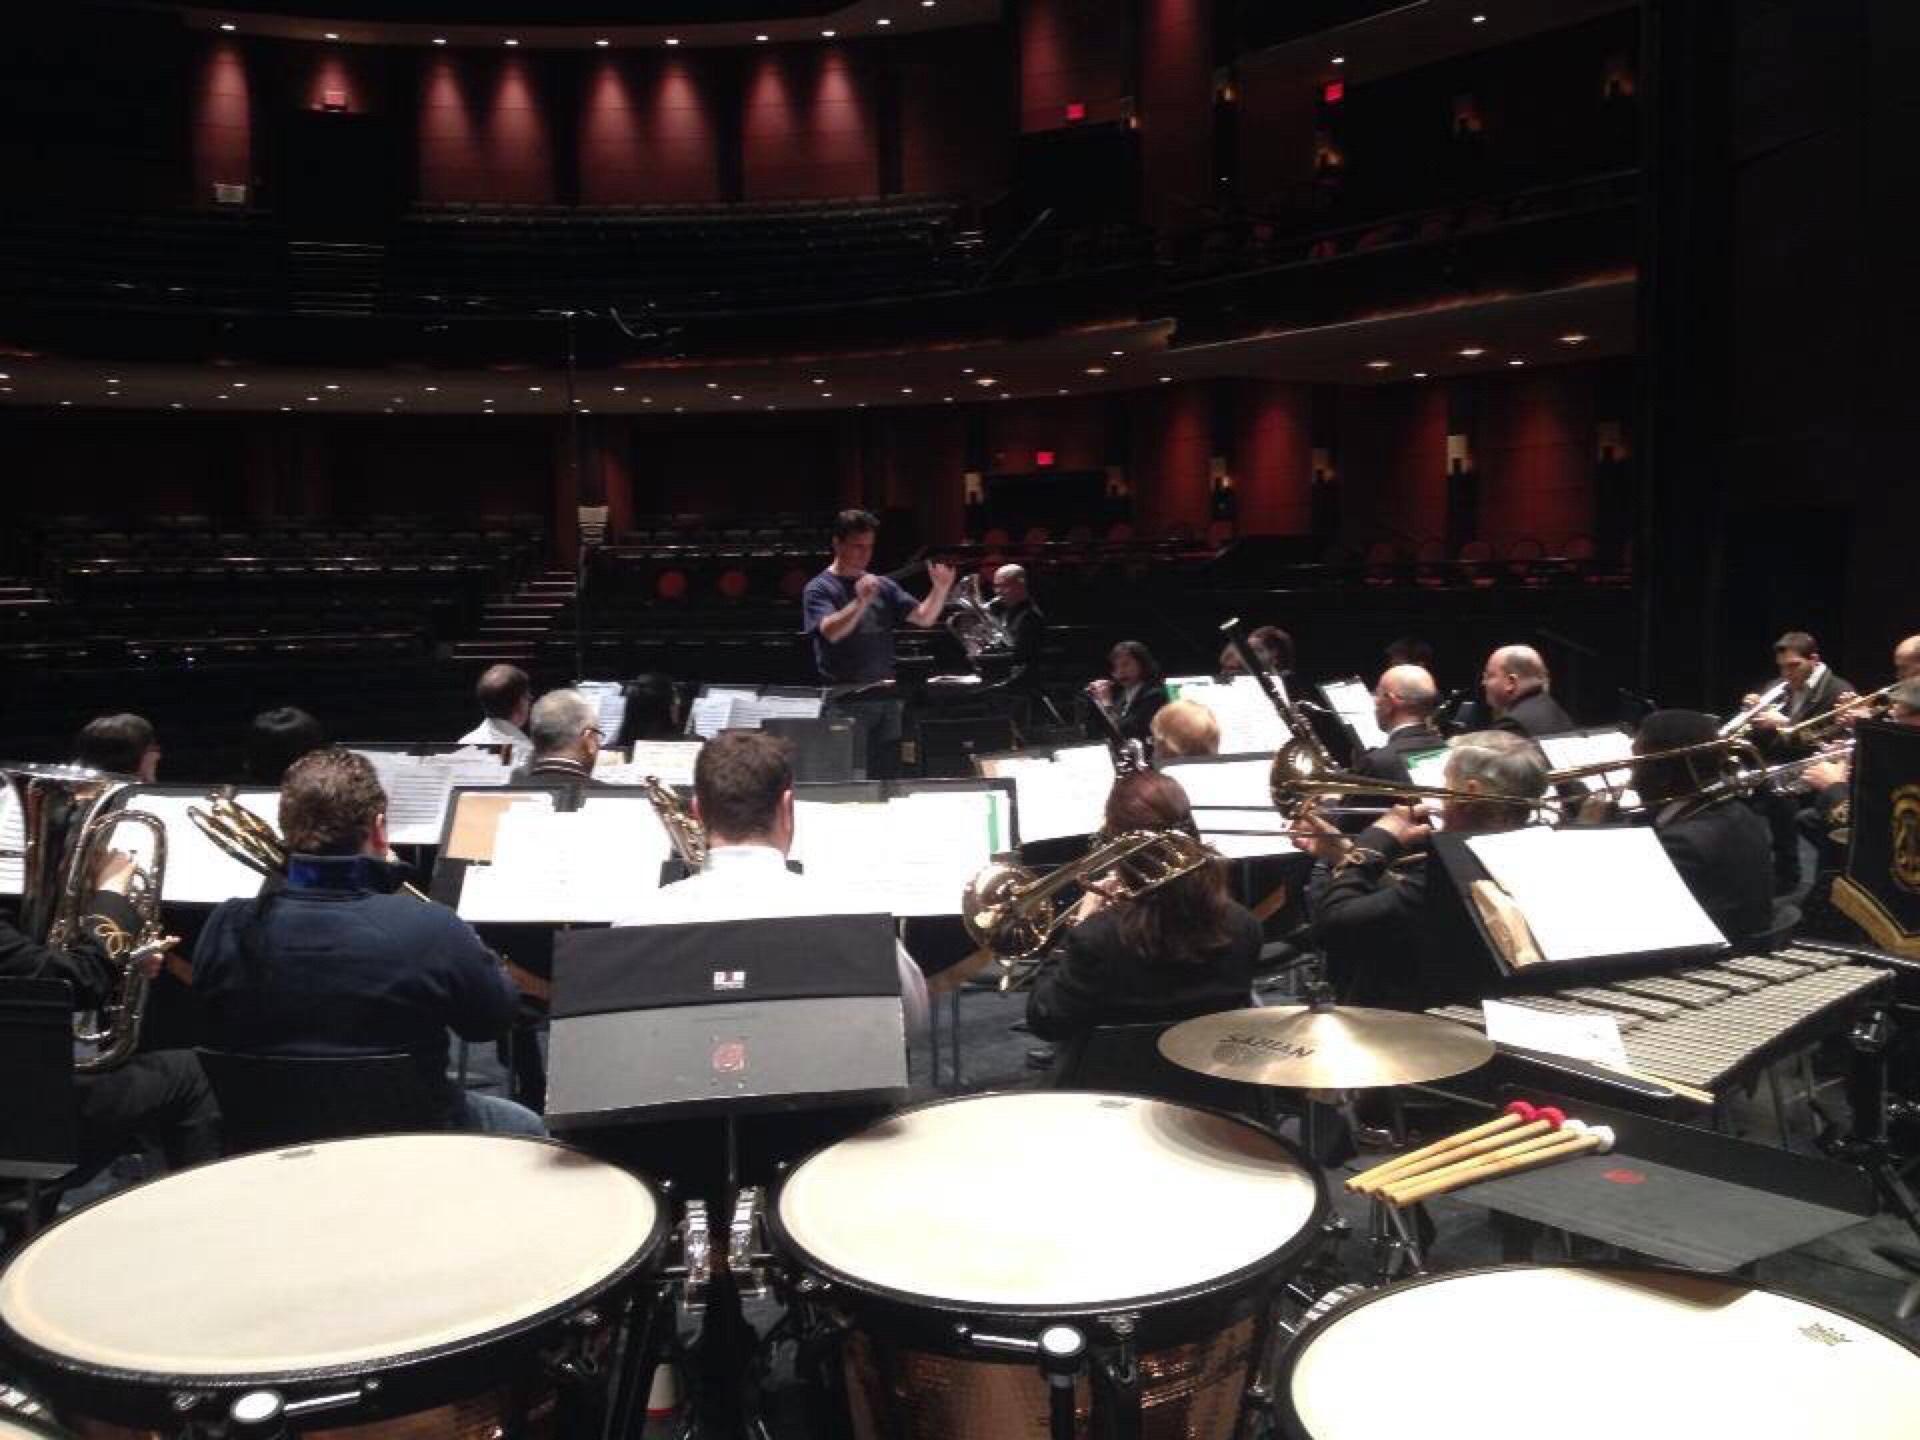 -Brampton Concert Band at the Rose Theatre